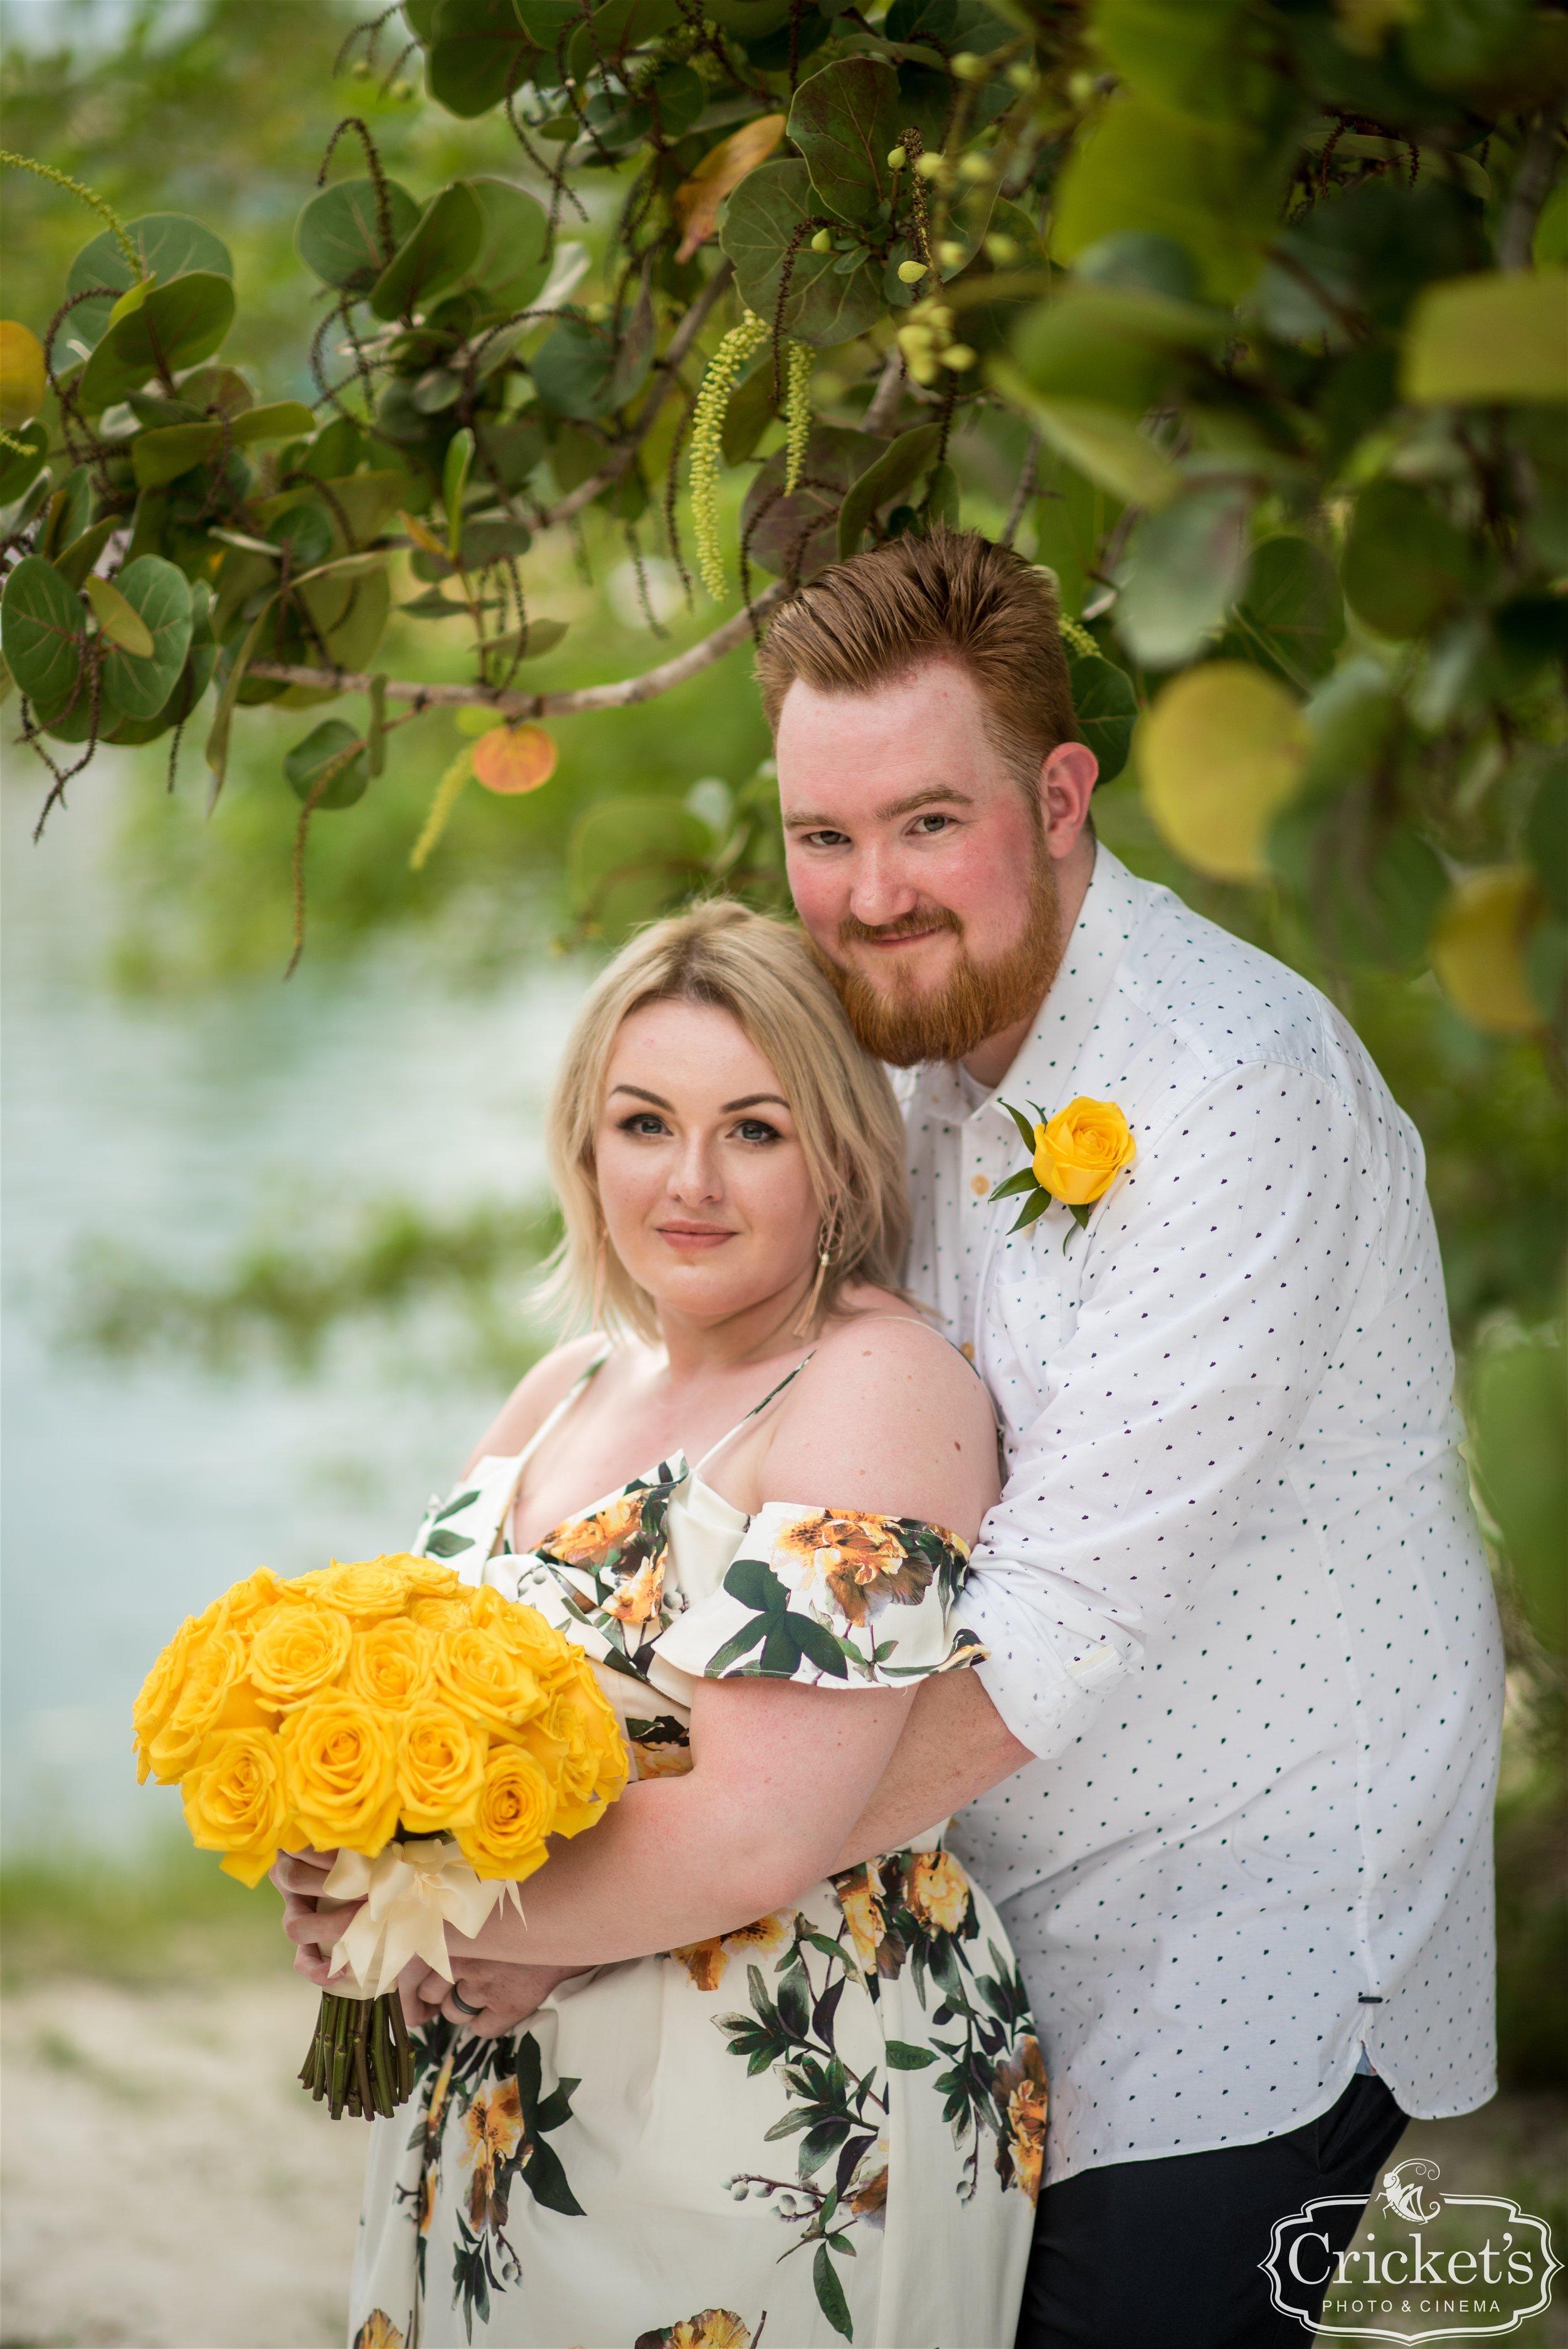 Wedding Photographer:  Cricket's Photo & Cinema |